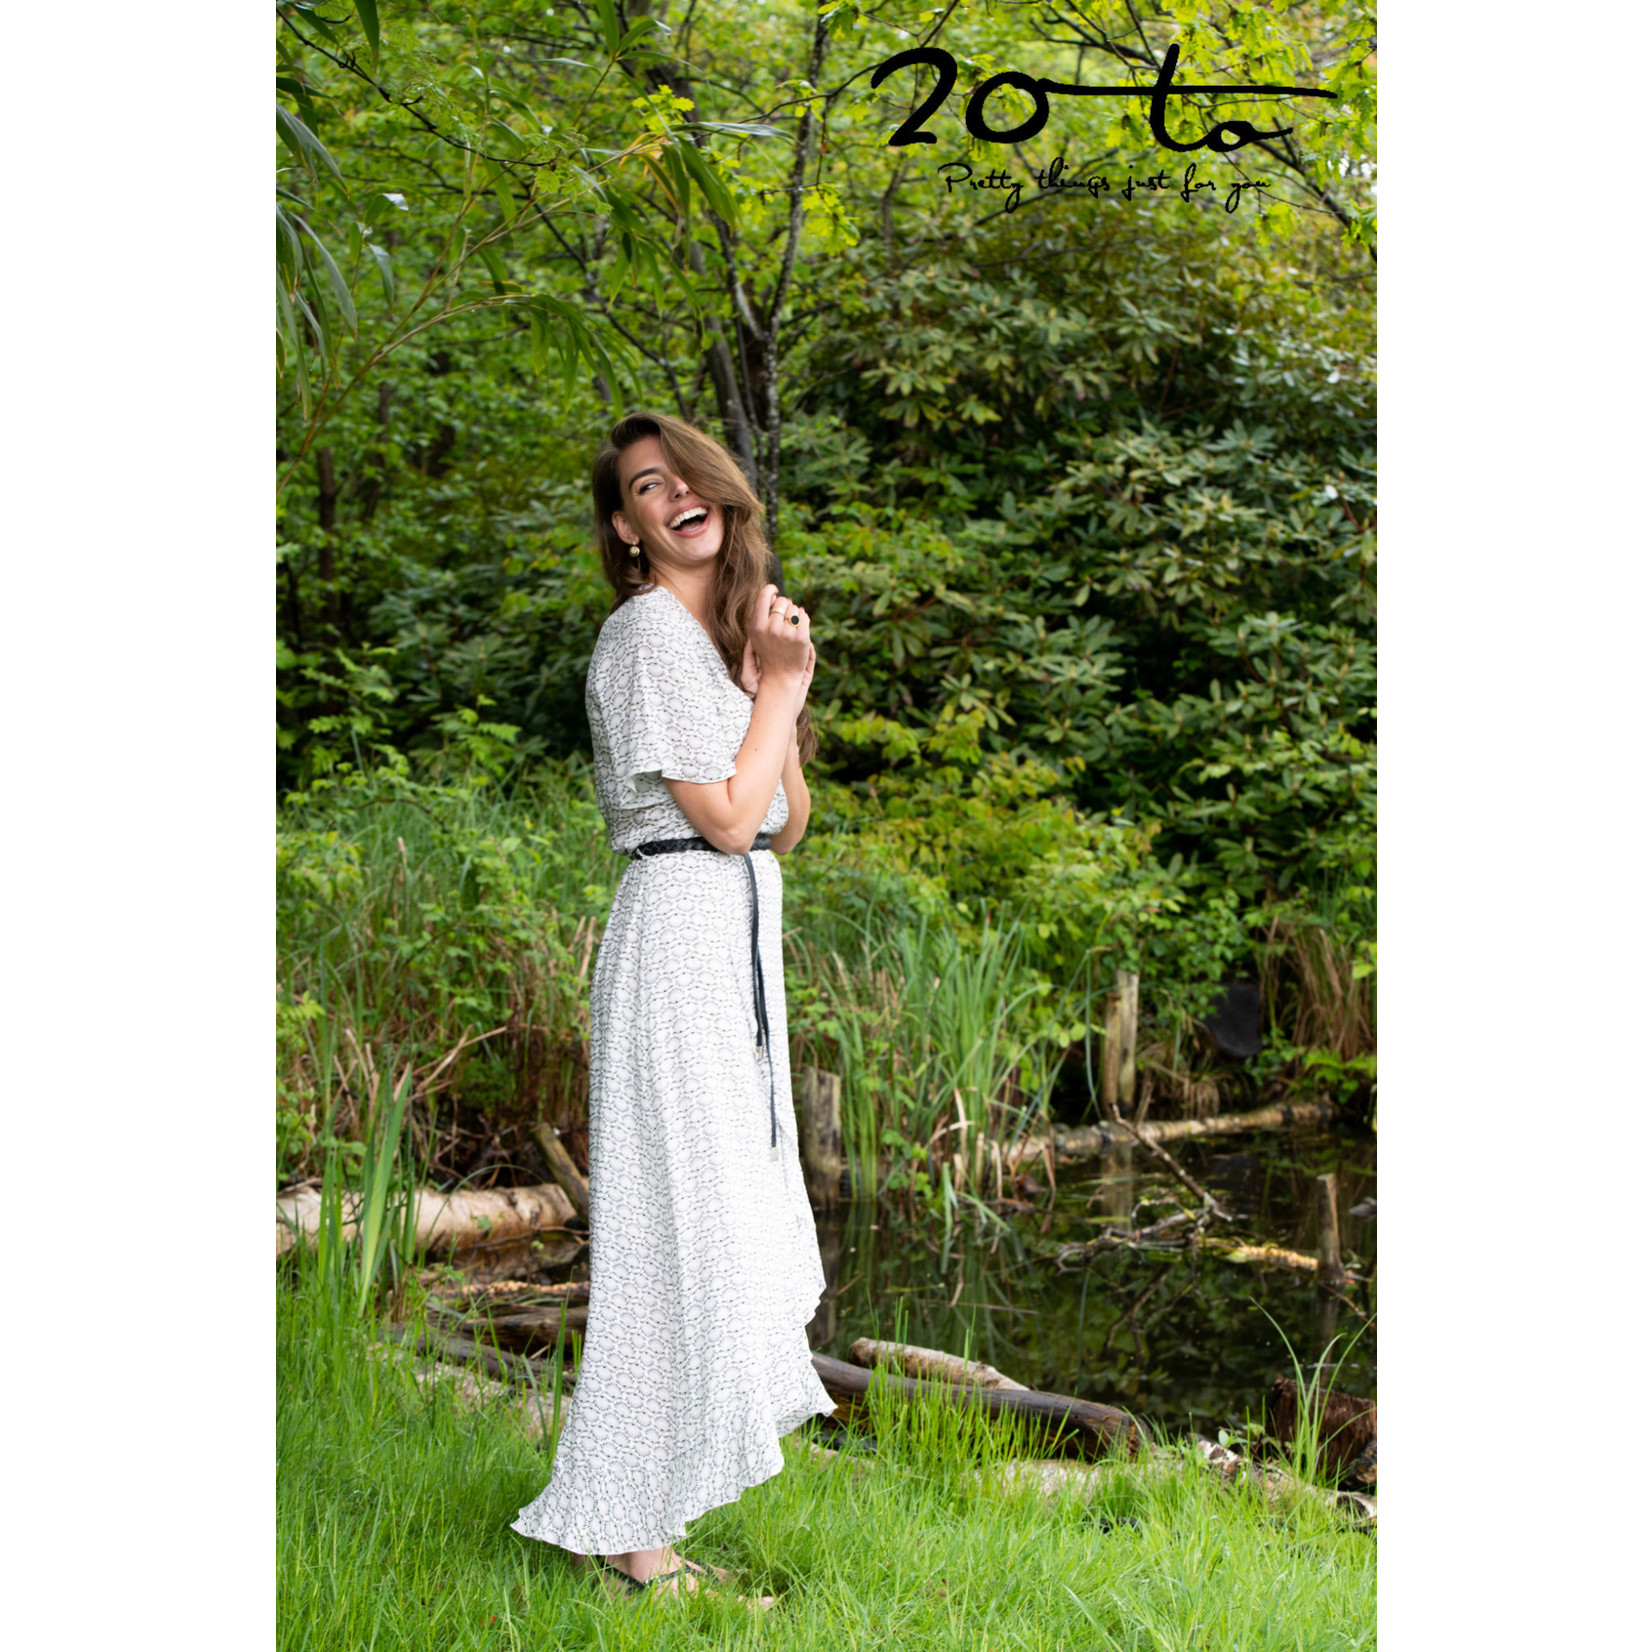 20 to 20-to Dress Roussel Lotus